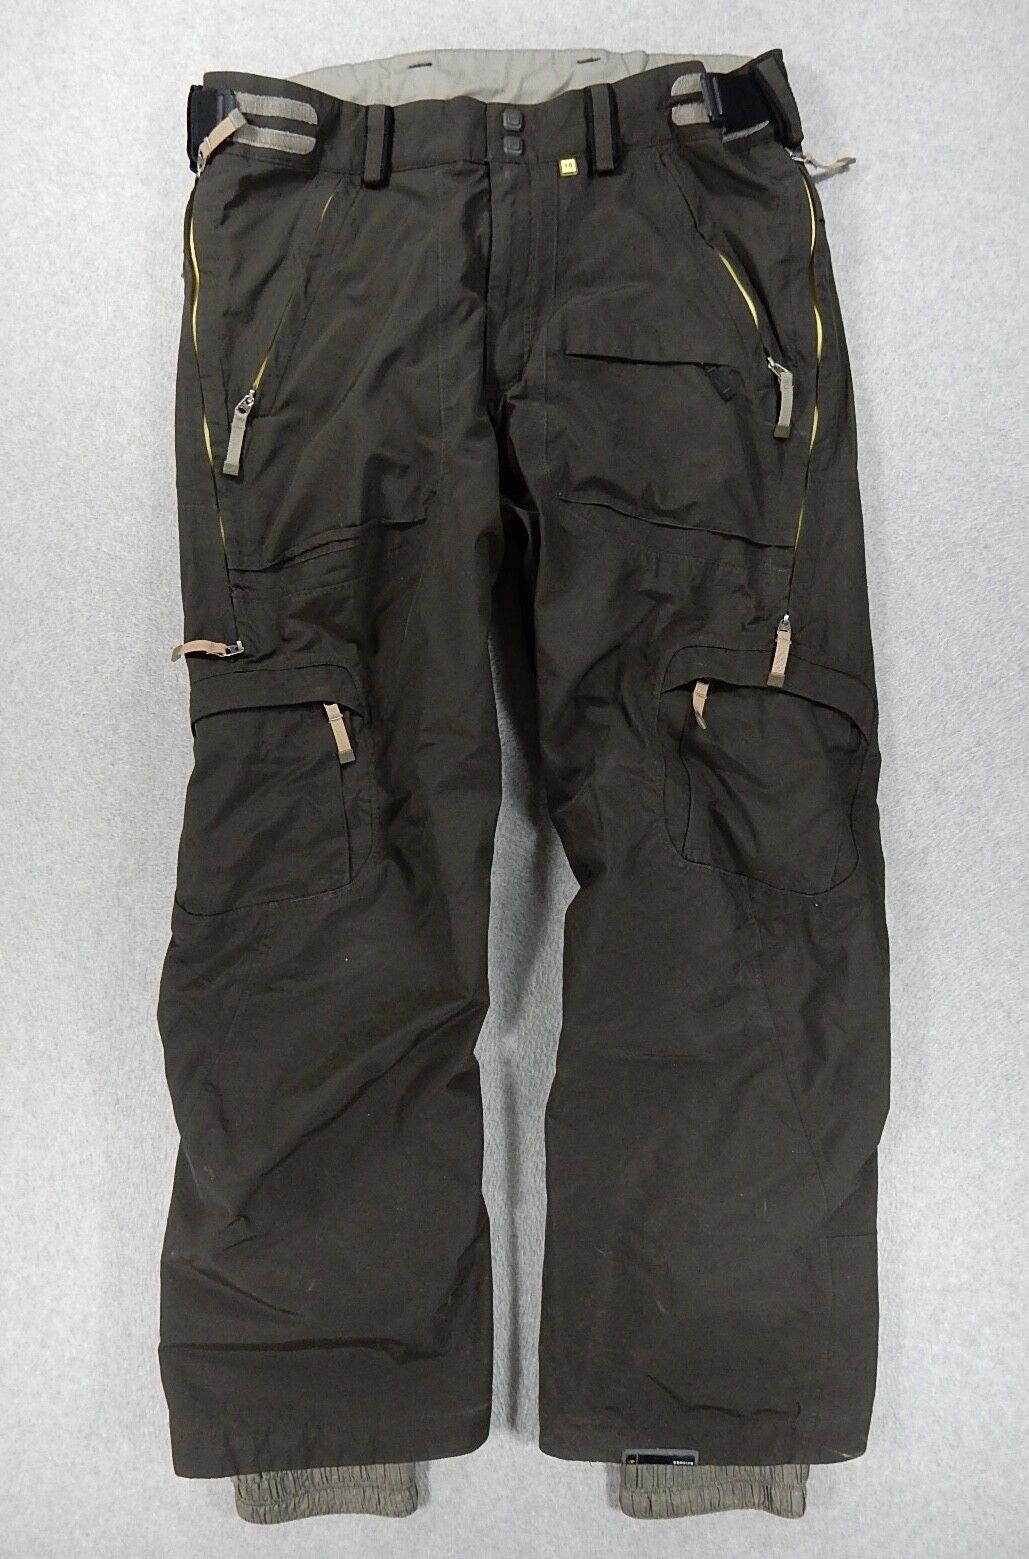 Bonfire KINETIC T10 WaterProof Breathable Ski SnowBoard Pants (Mens Large) Brown